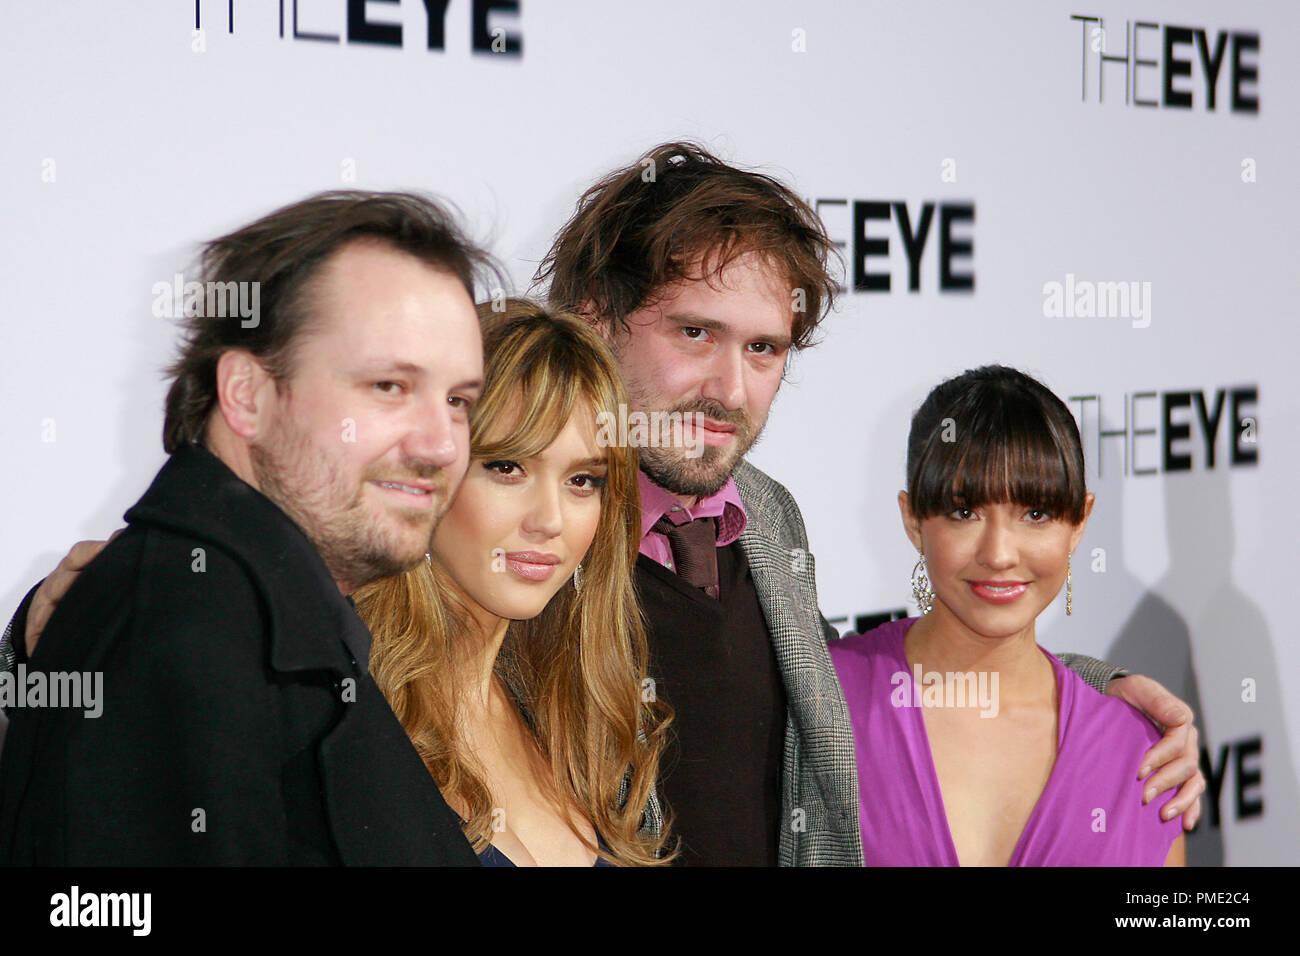 a670167e8443 The Eye Premiere Director David Moreau, Jessica Alba and Director Xavier  Palud, Fernanda Romera